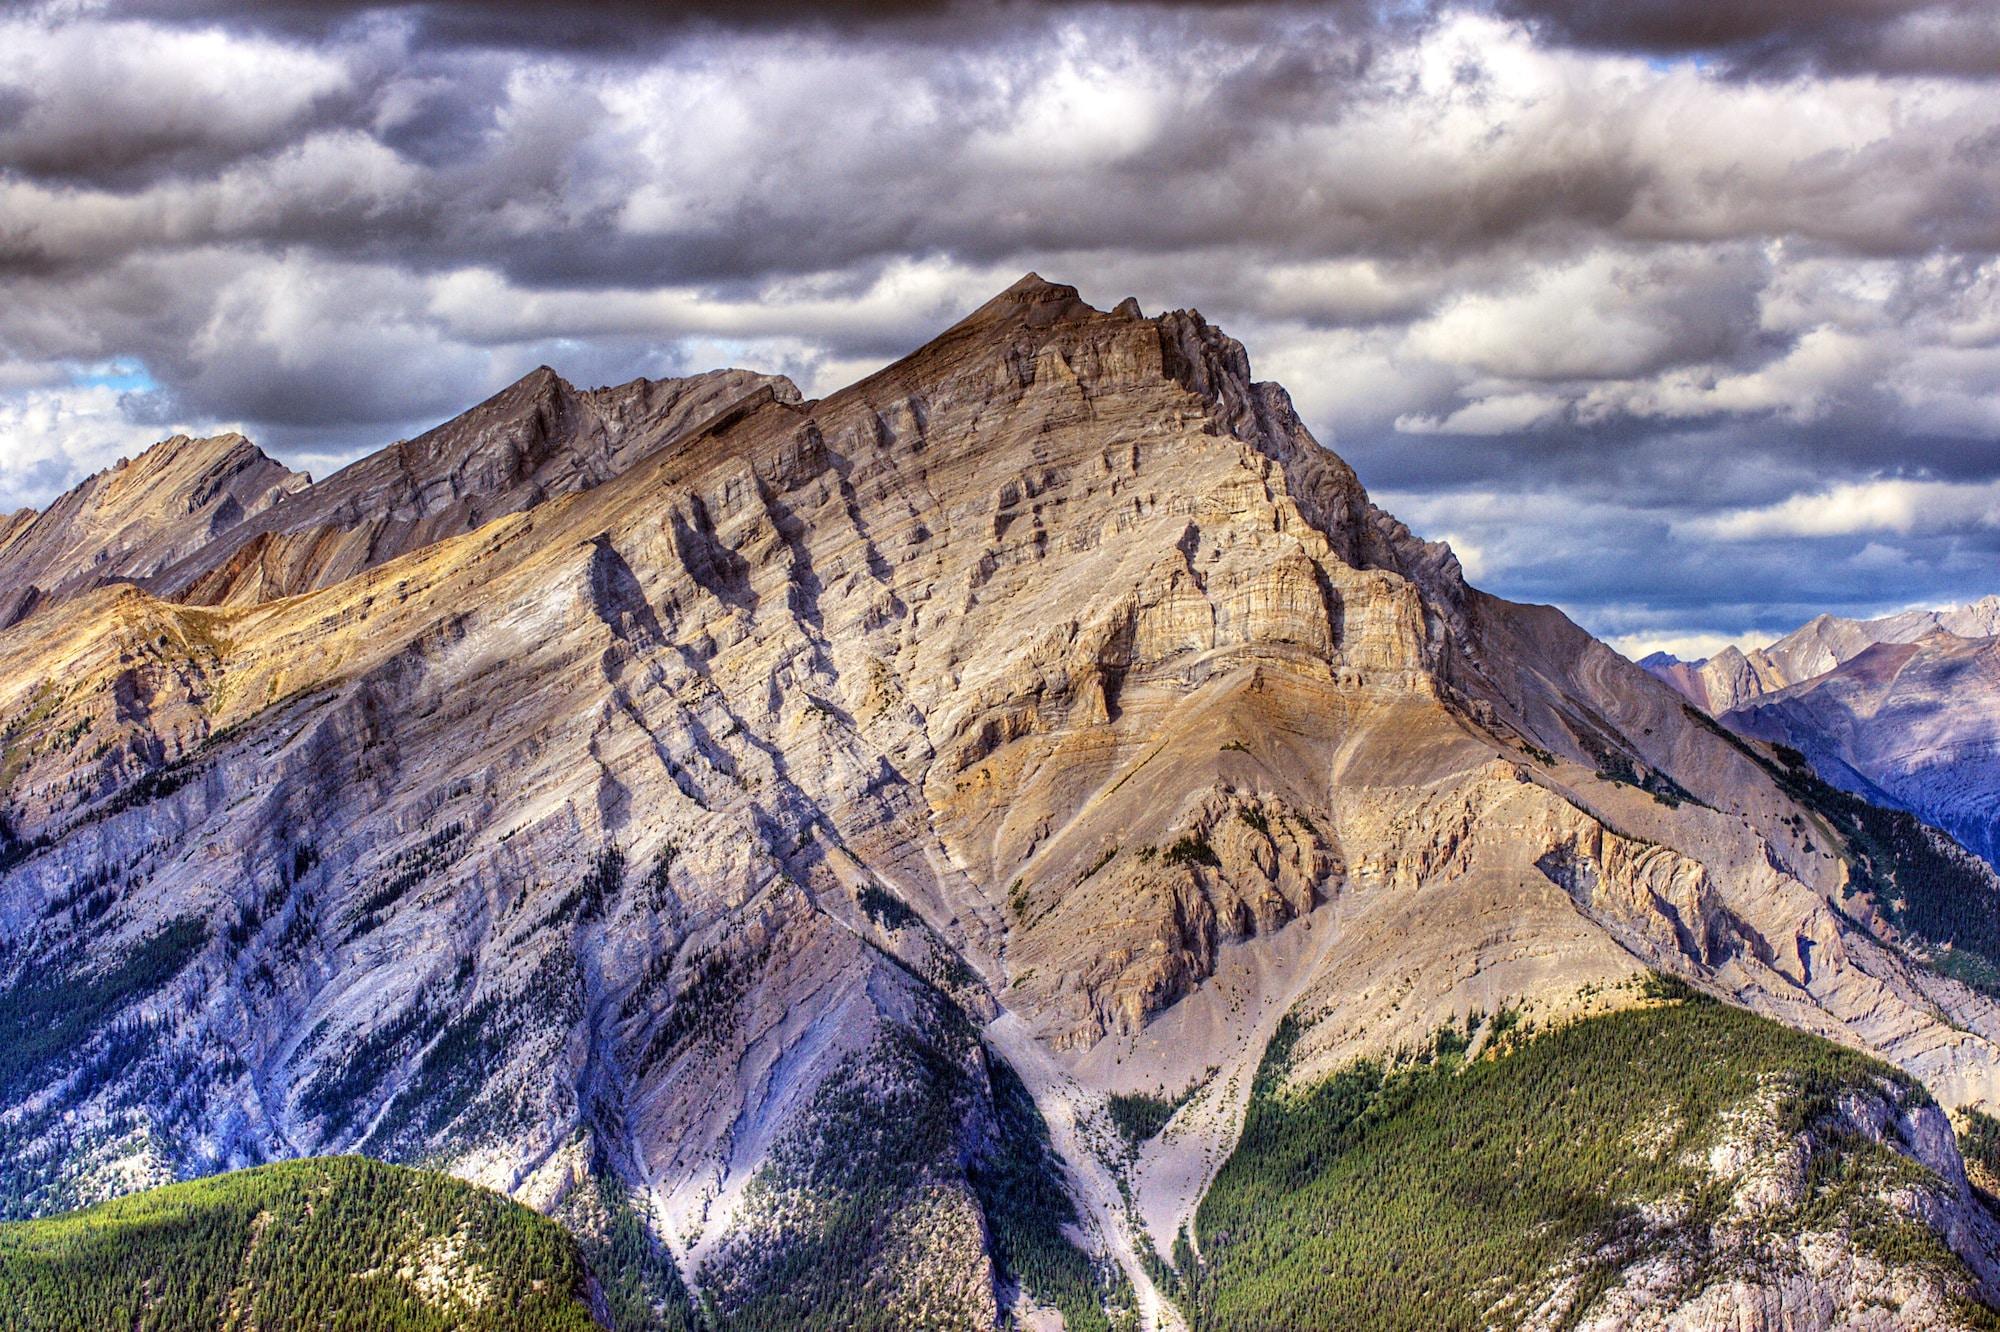 A tall rugged mountain under dense clouds